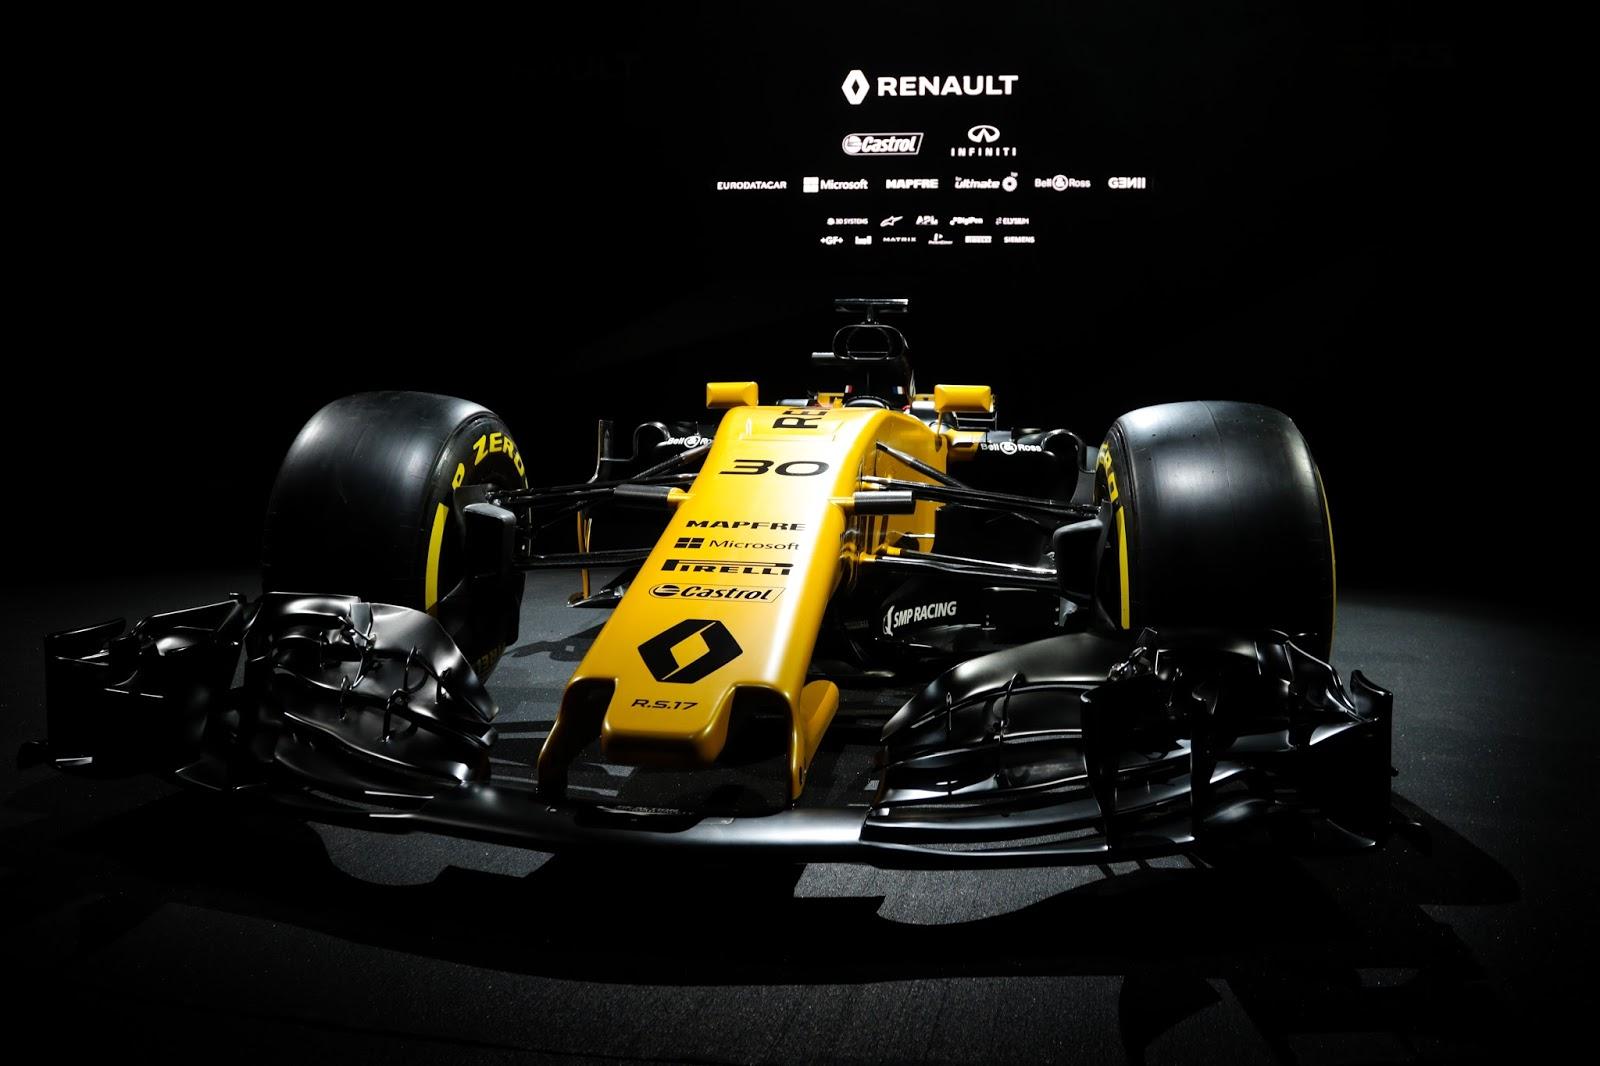 210217 RL 002 1 Η Renault Sport παρουσίασε το καινούργιο της μονοθέσιο, την R.S.17 F1, Formula 1, Renault, Renault Sport Formula 1 Team, videos